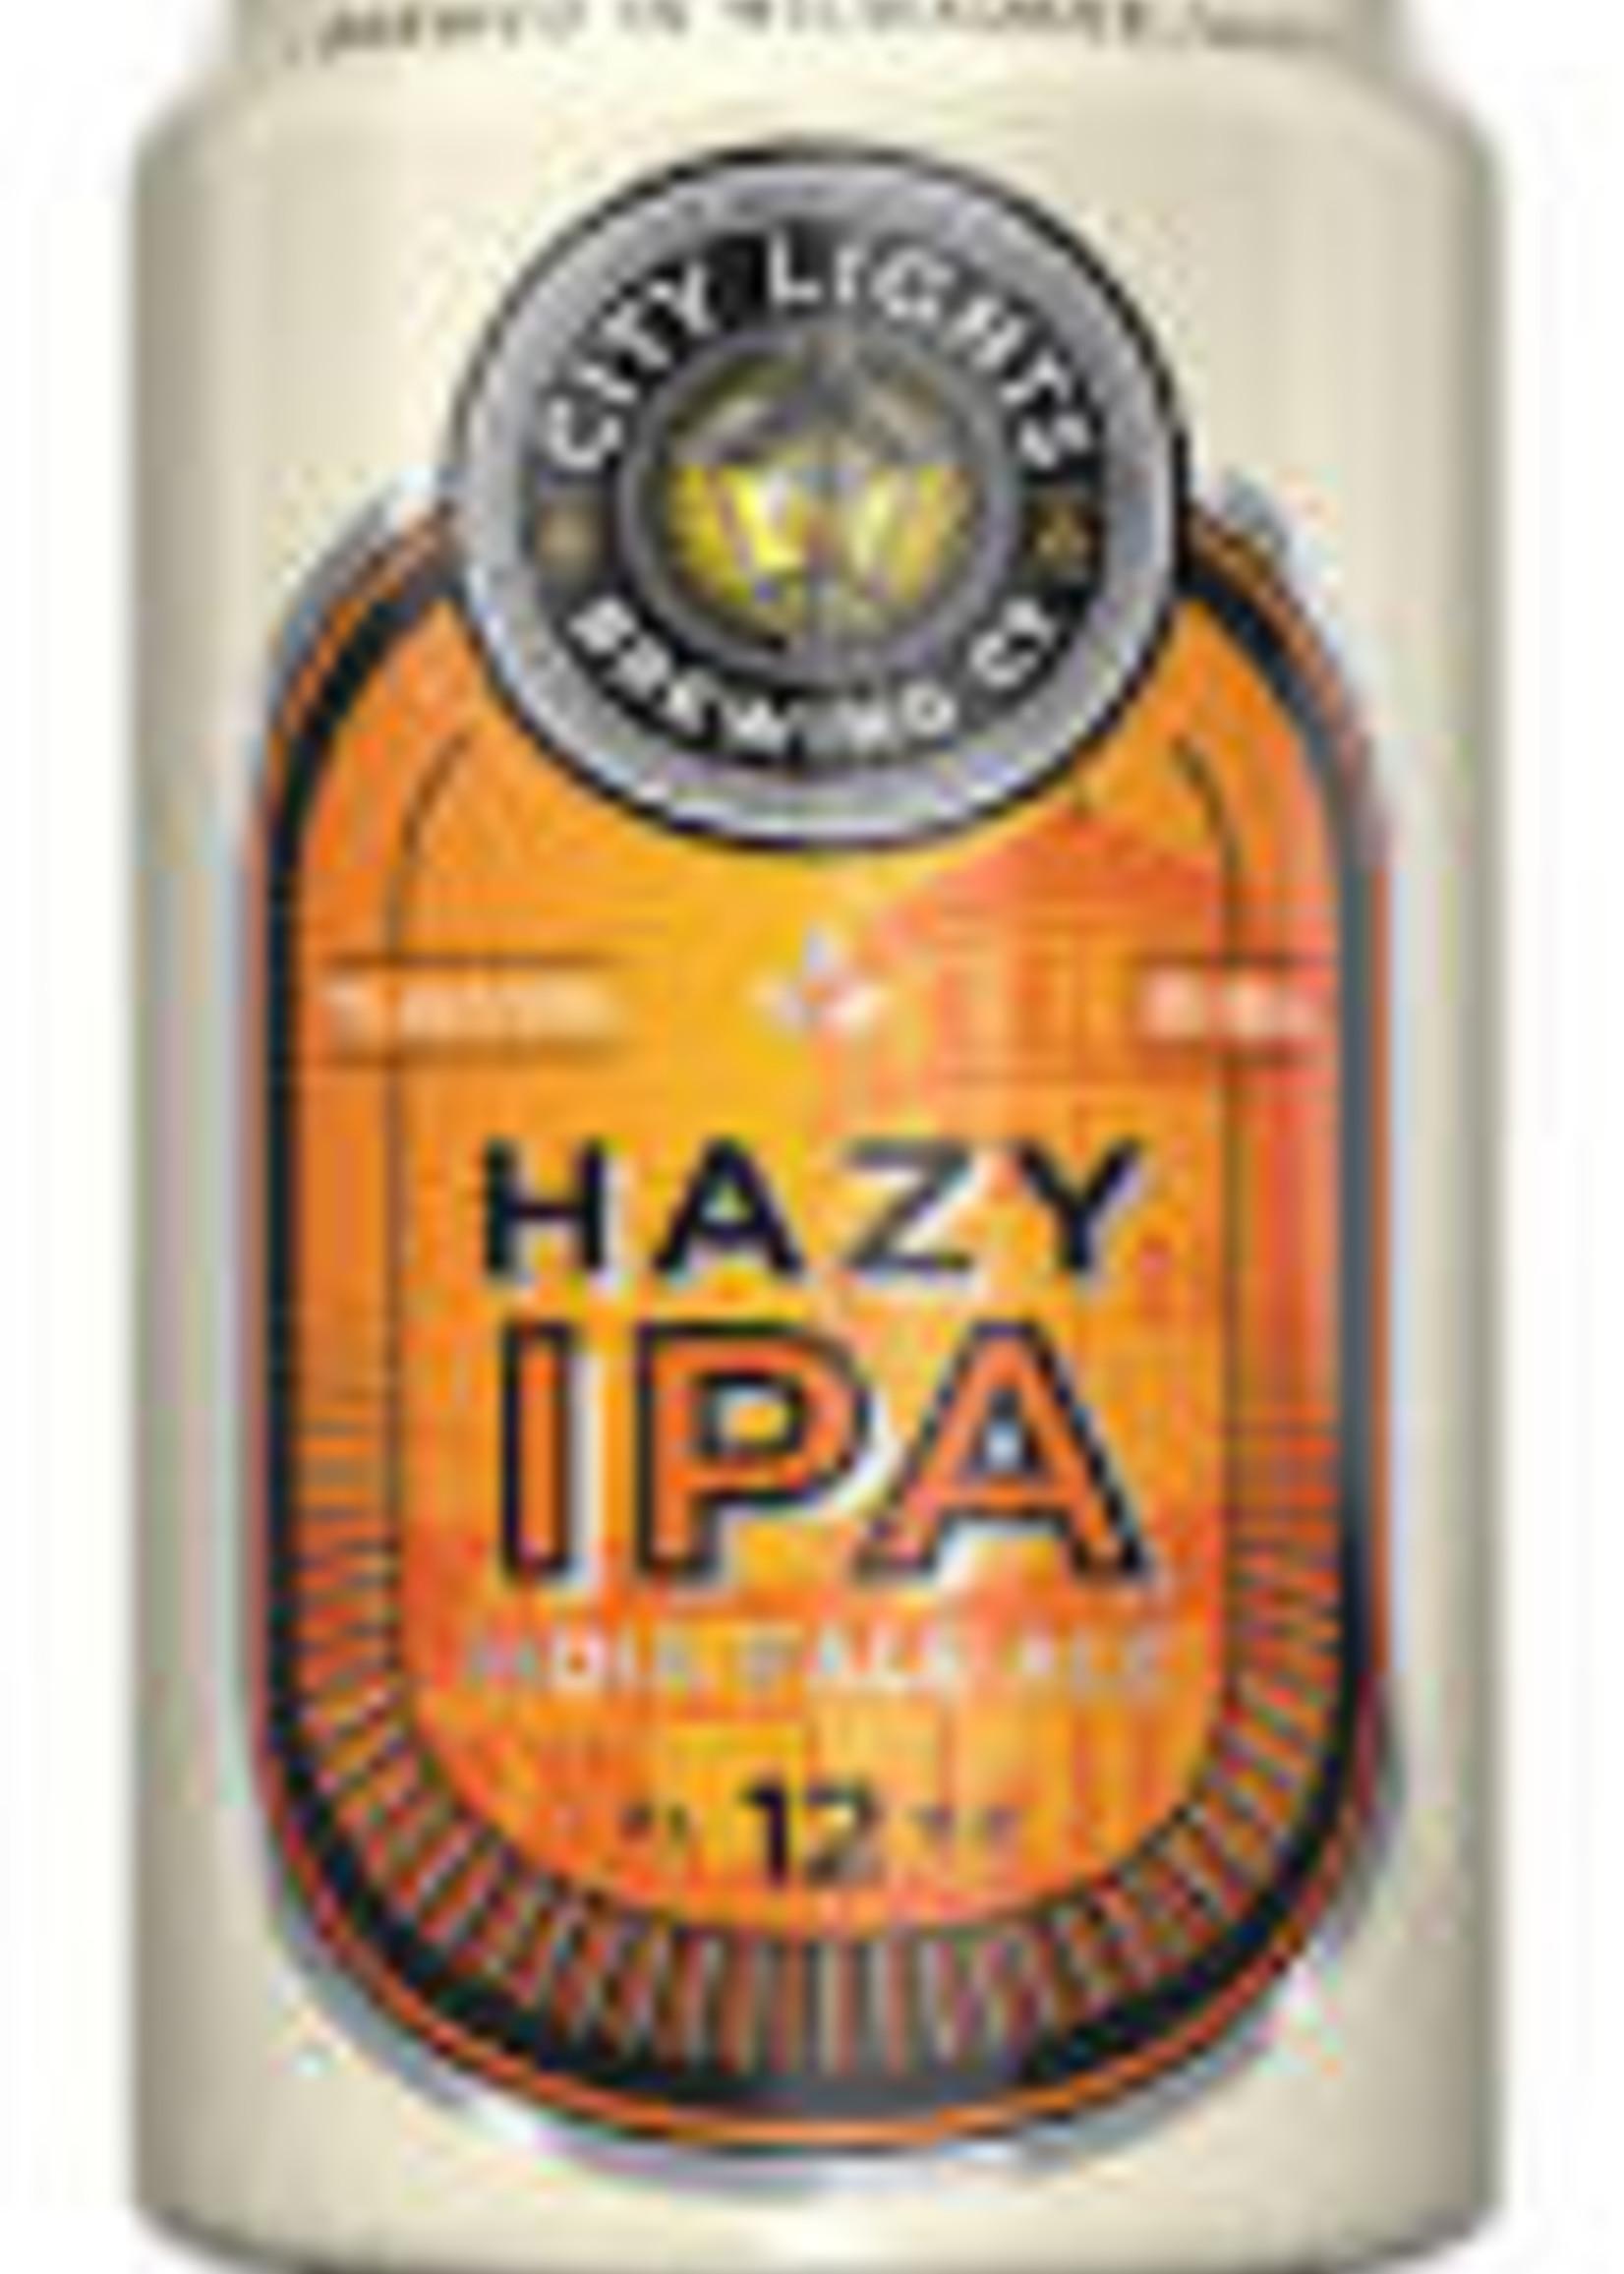 City Lights Hazy IPA - 6x12oz Cans